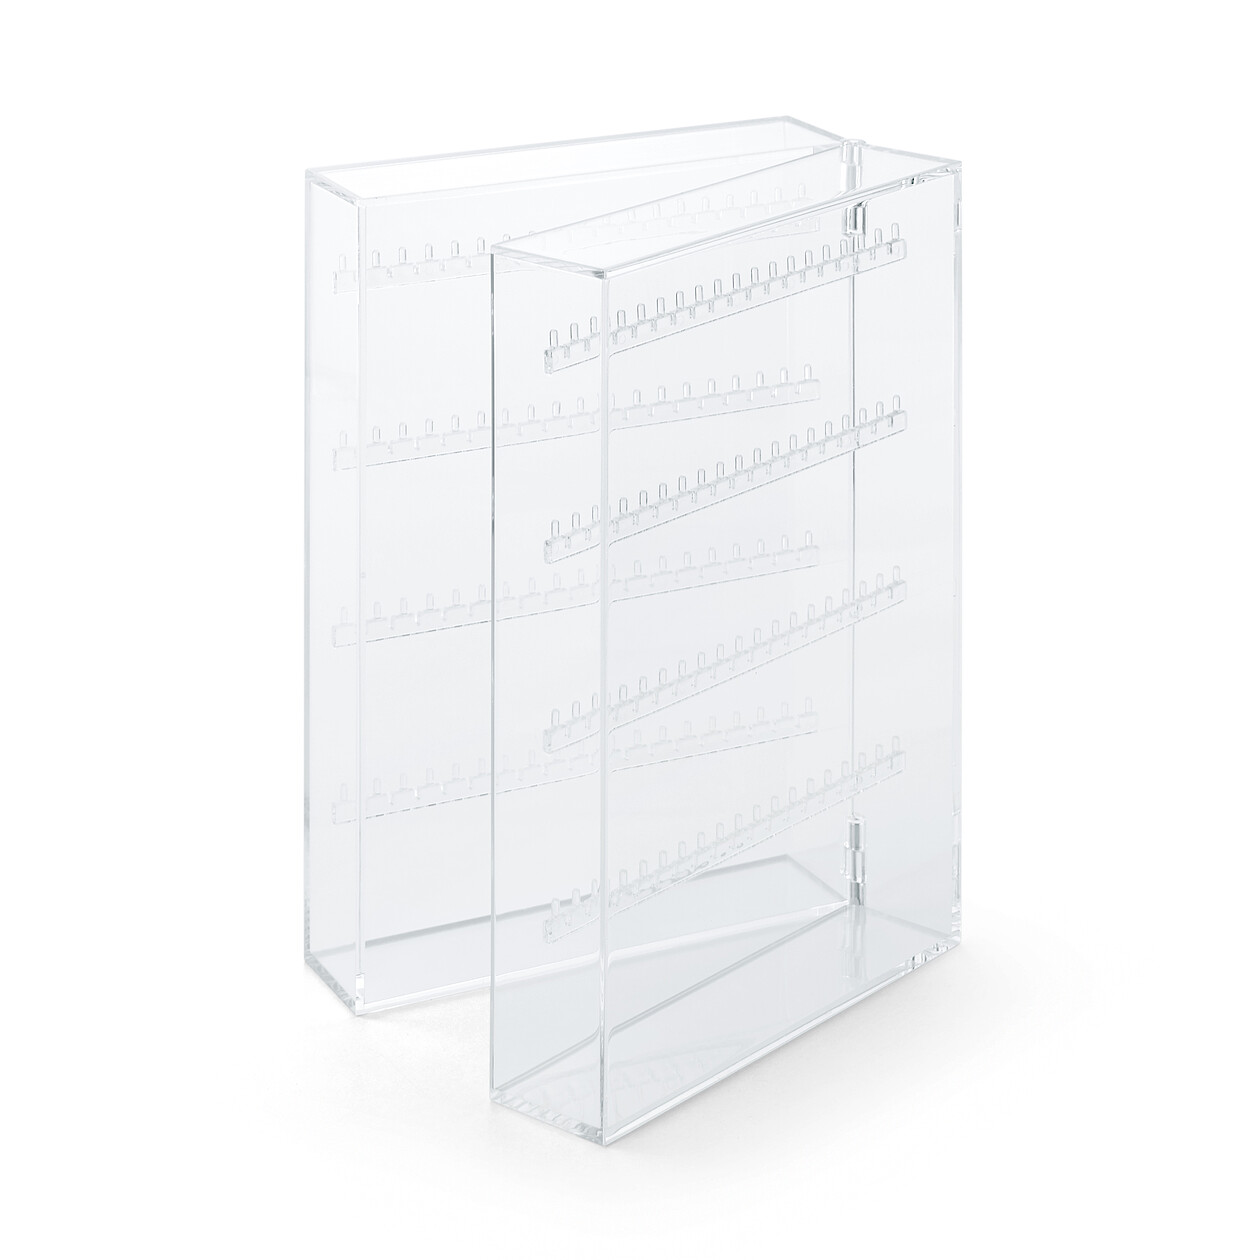 RoomClip商品情報 - アクリルネックレス・ピアスケース・見開きタイプ